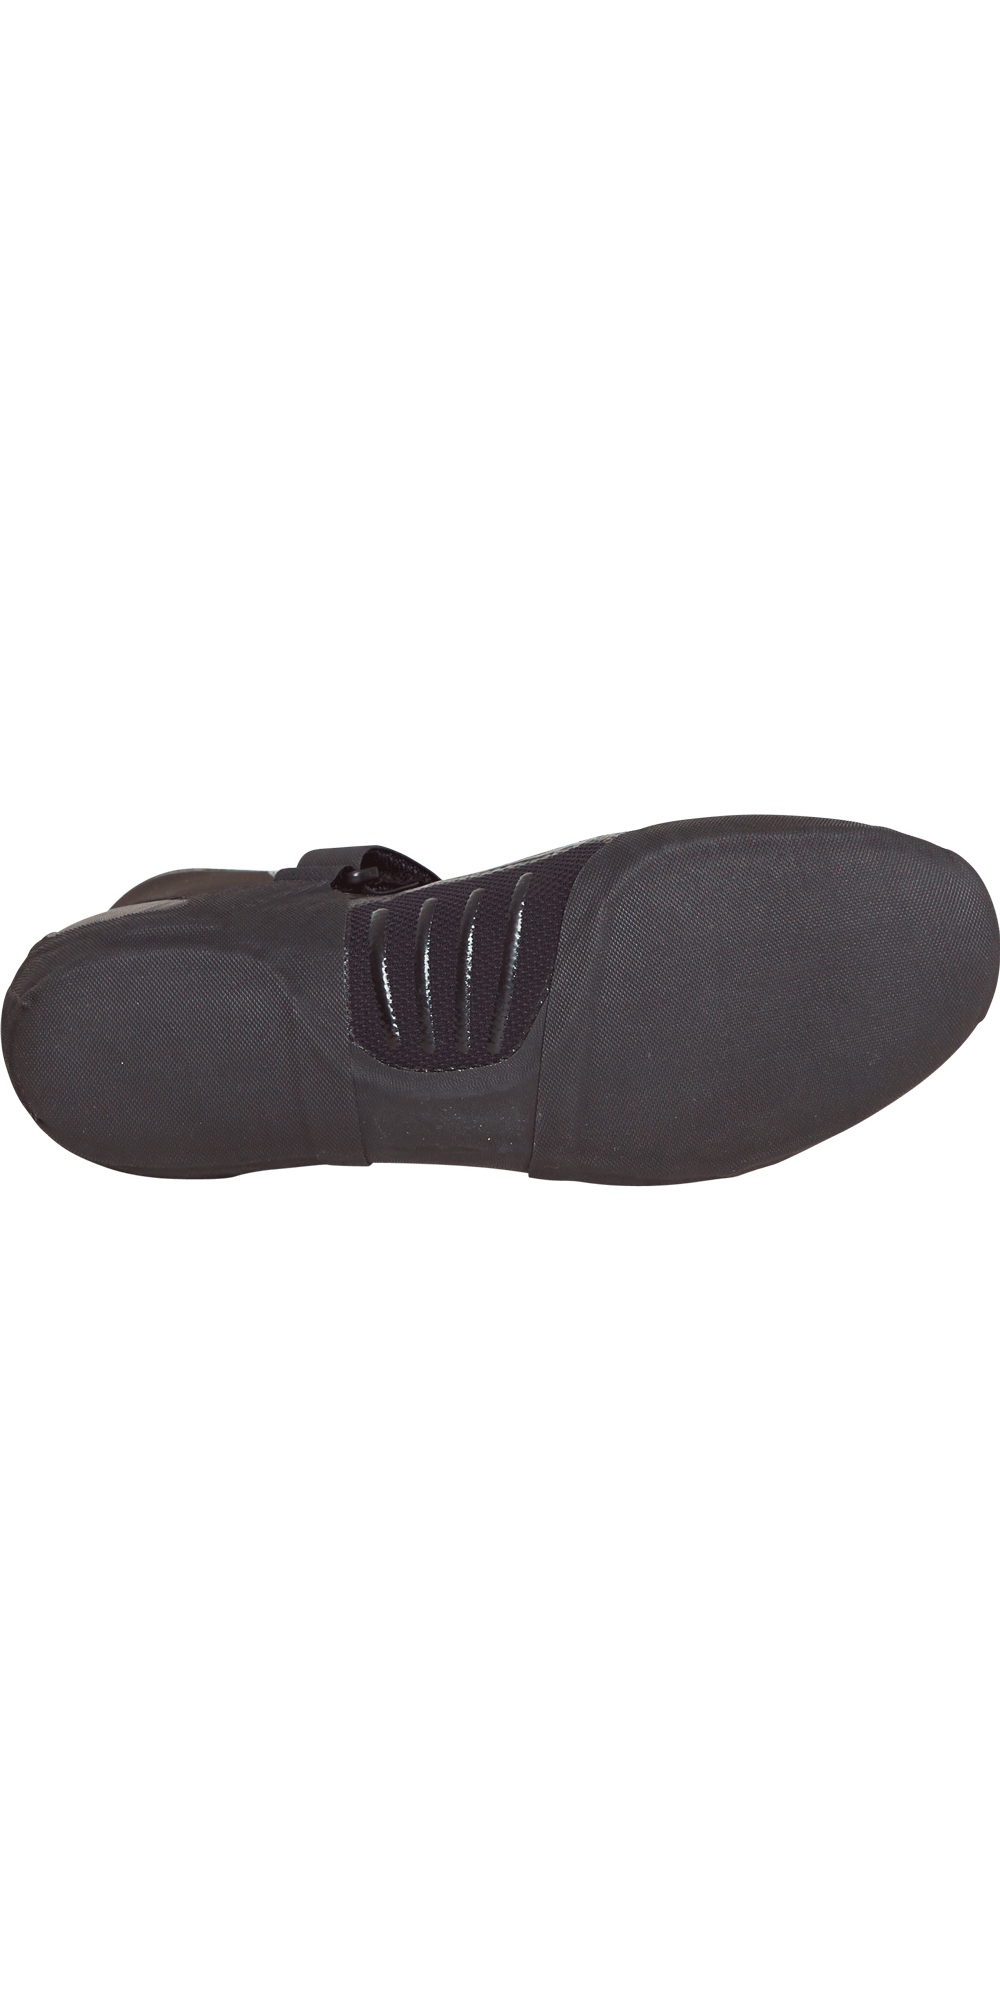 Billabong Furnace Carbon Ultra 5mm Round Toe Boots Black L4BT21